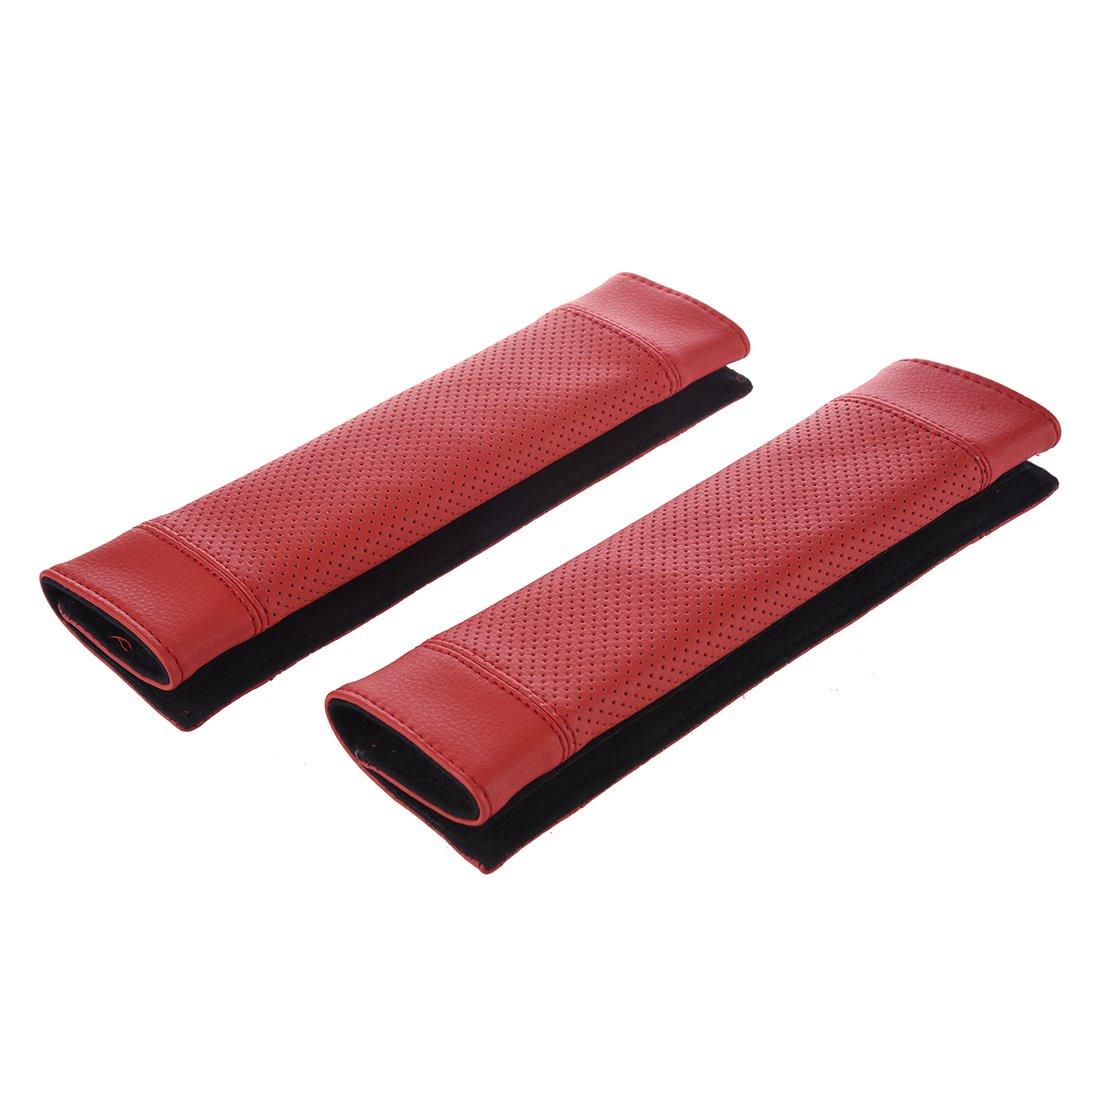 SODIAL(R) 2Pcs PU Leather Car Seat Belt Shoulder pads Cover Black & Red LEPACA4150